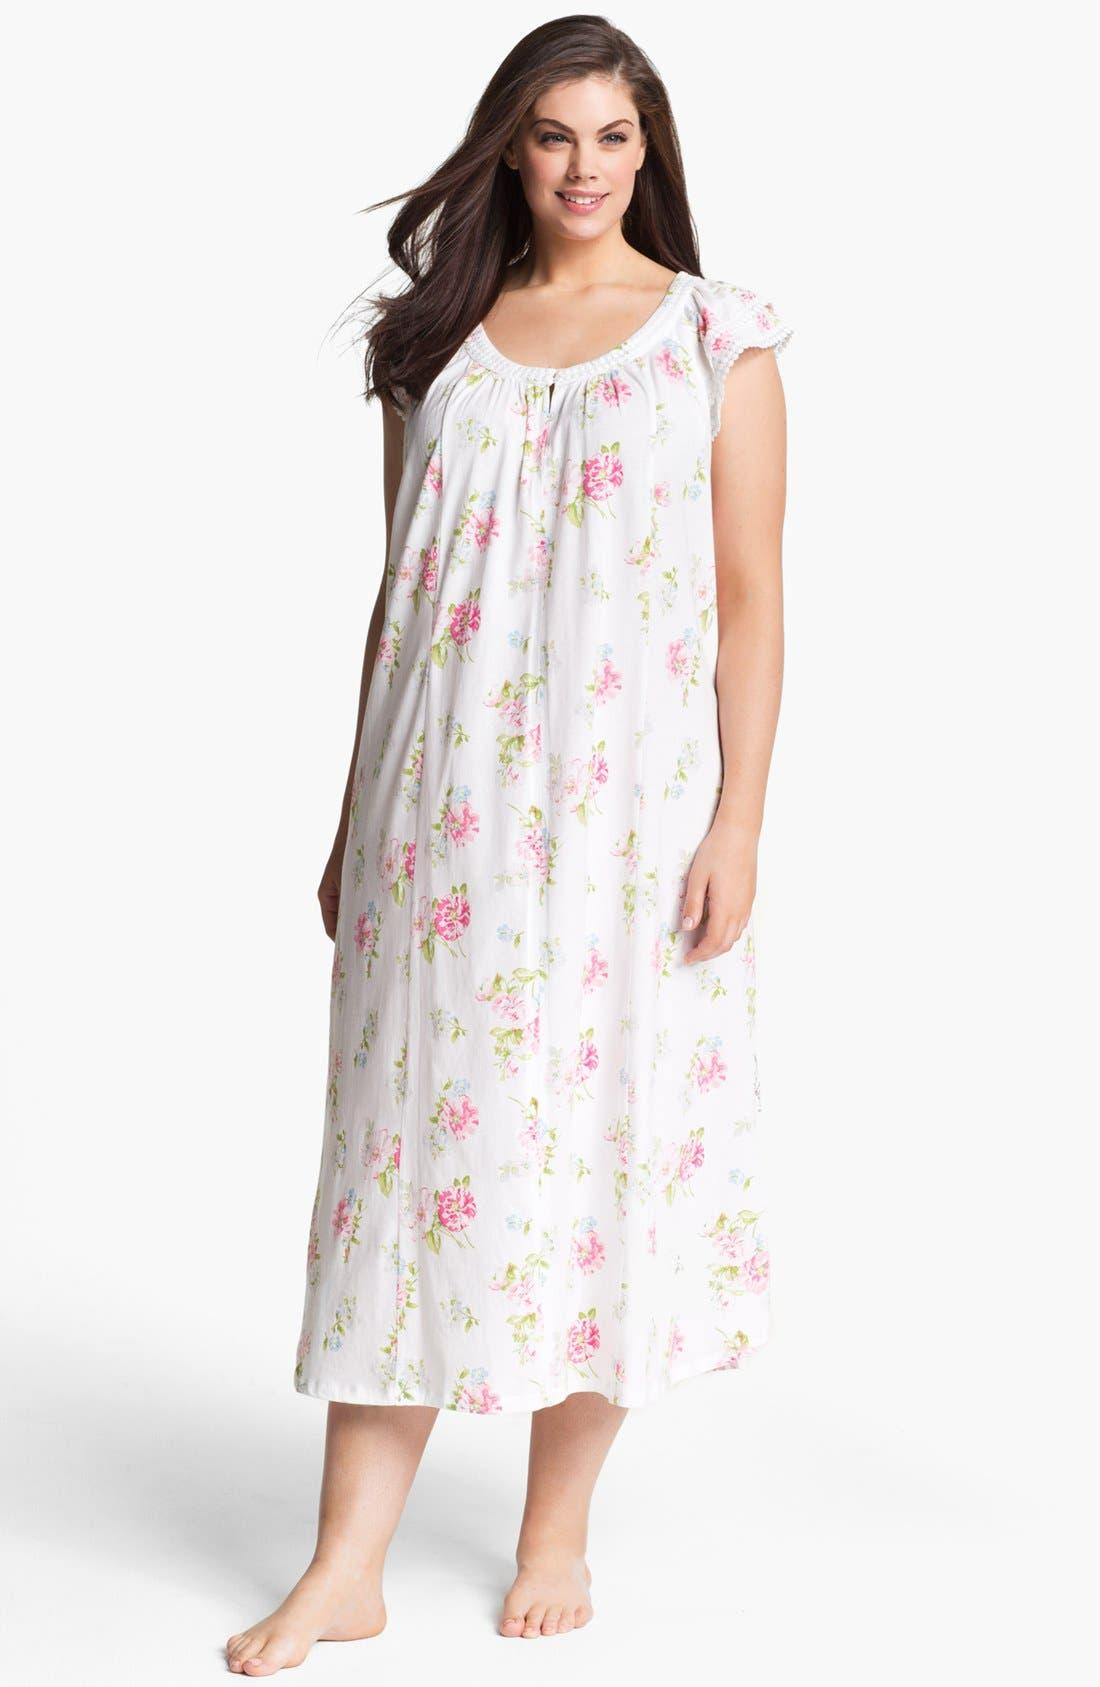 Alternate Image 1 Selected - Carole Hochman Designs Cap Sleeve Nightgown (Plus Size)